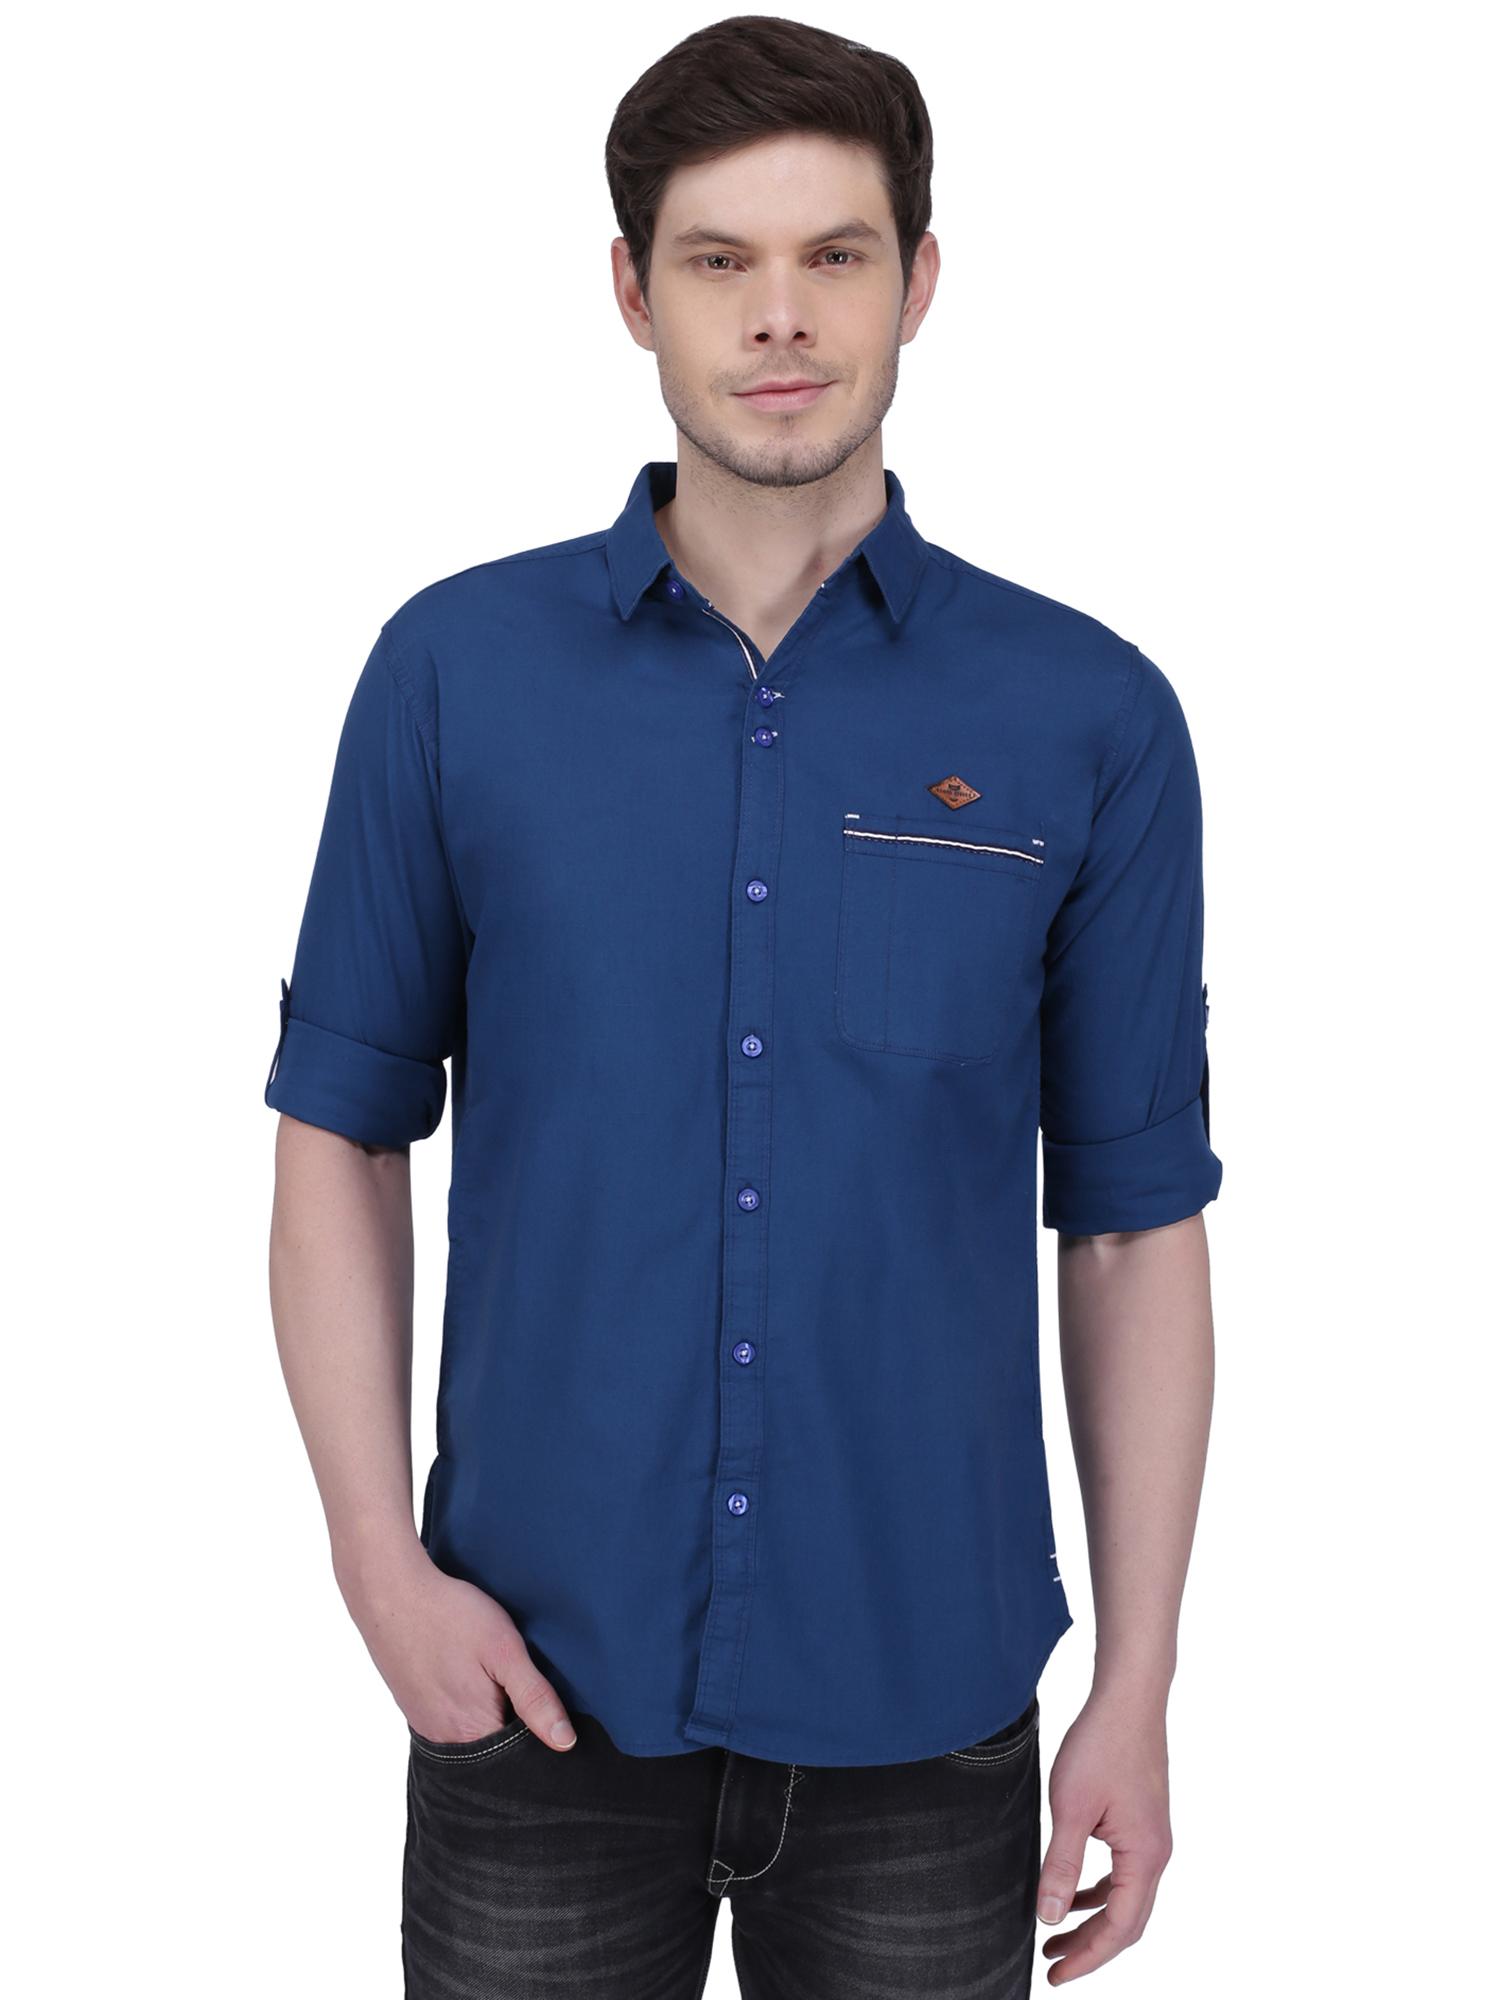 Kuons Avenue | Kuons Avenue Men's Royal Blue Linen Cotton Shirt- KACLFS1303BU